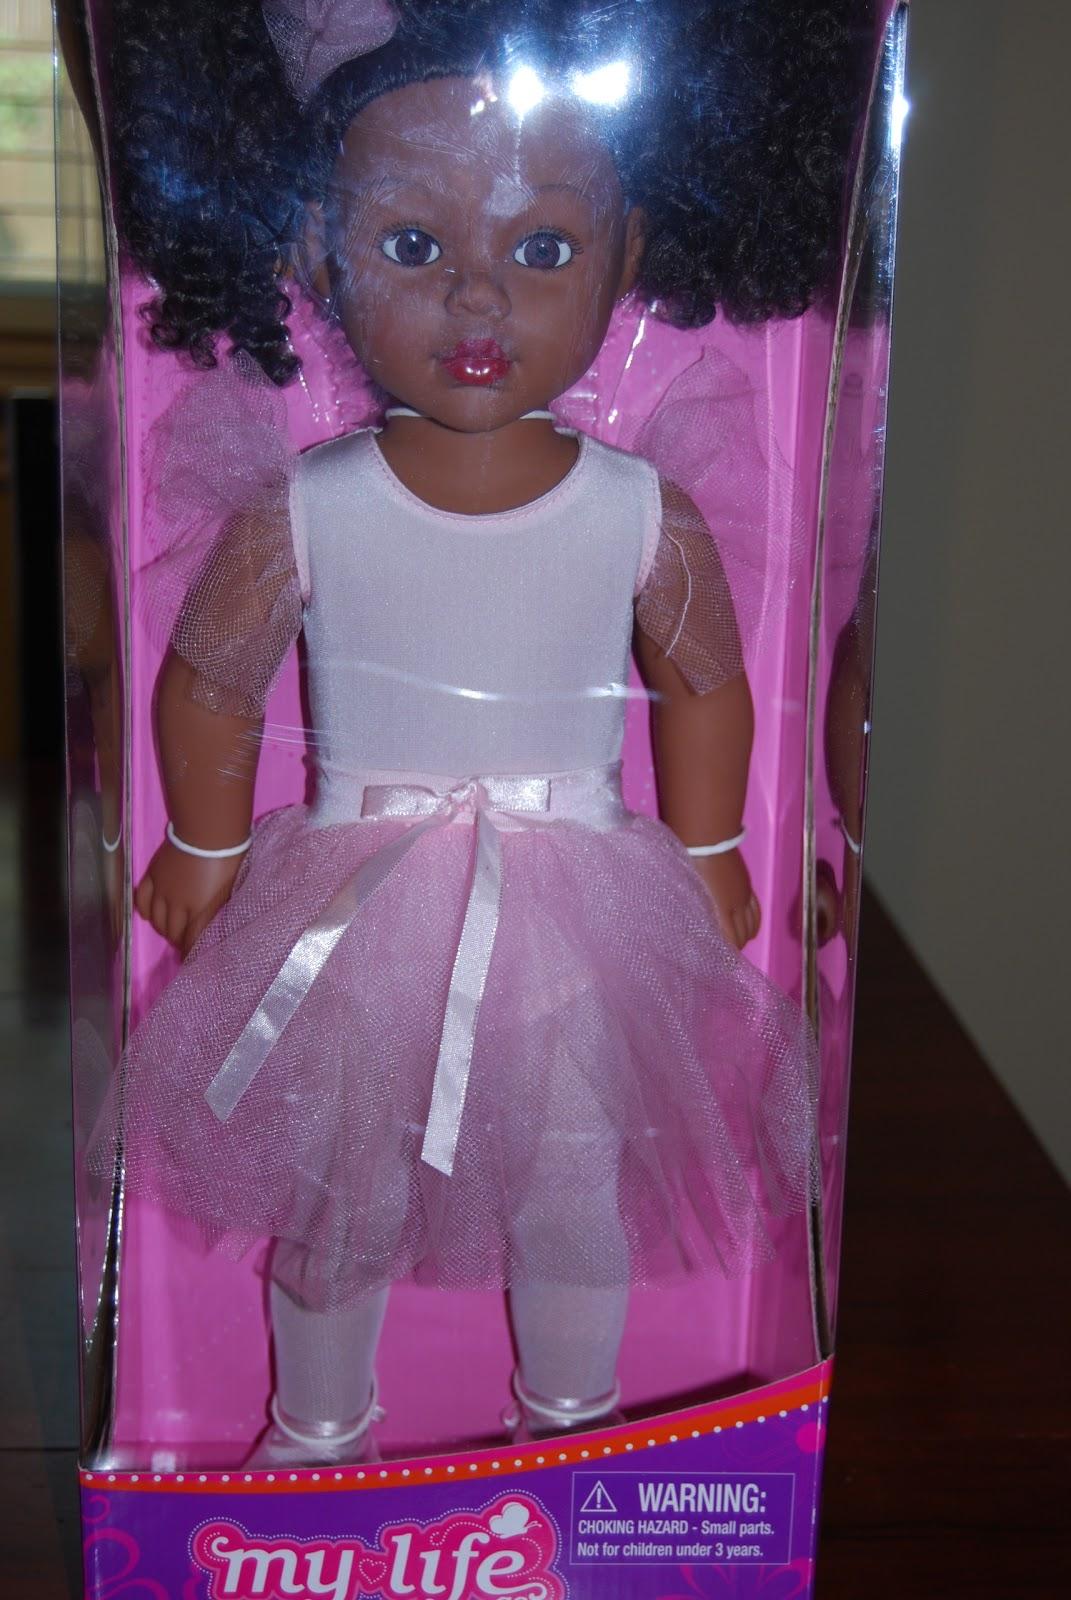 Life size dolls at walmart